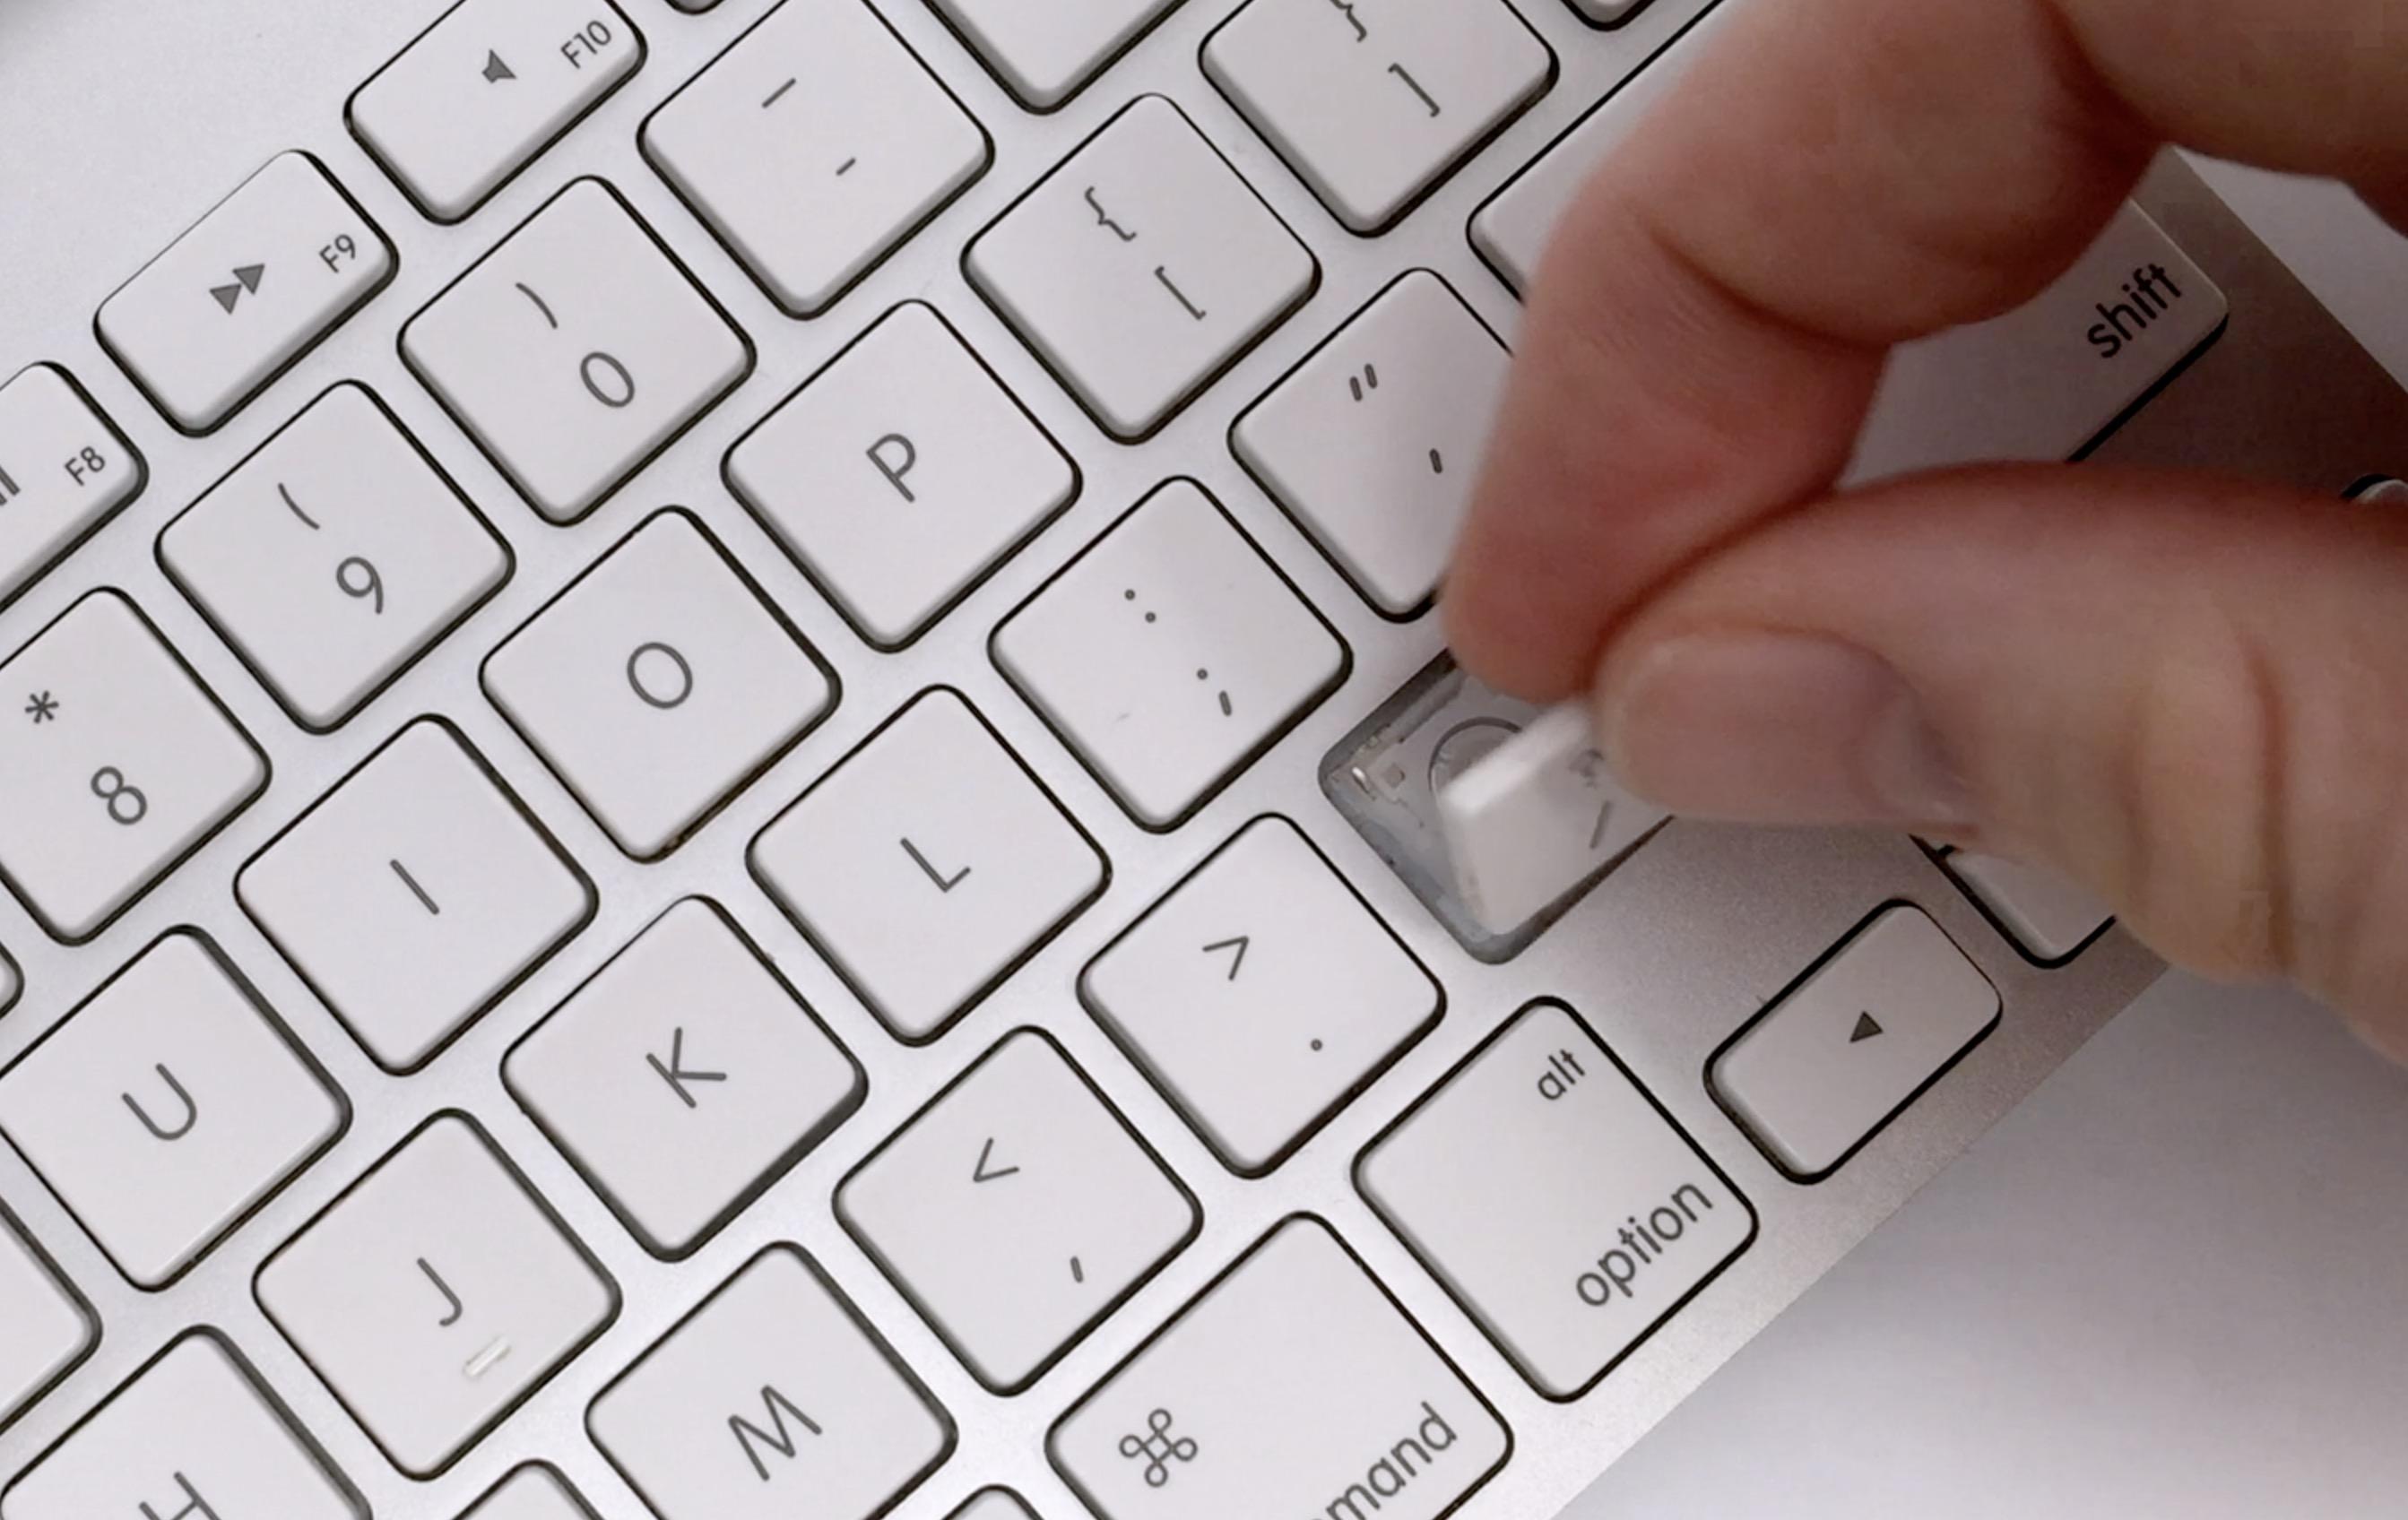 How To Fix Mac Keyboard Keys That Have Fallen Off